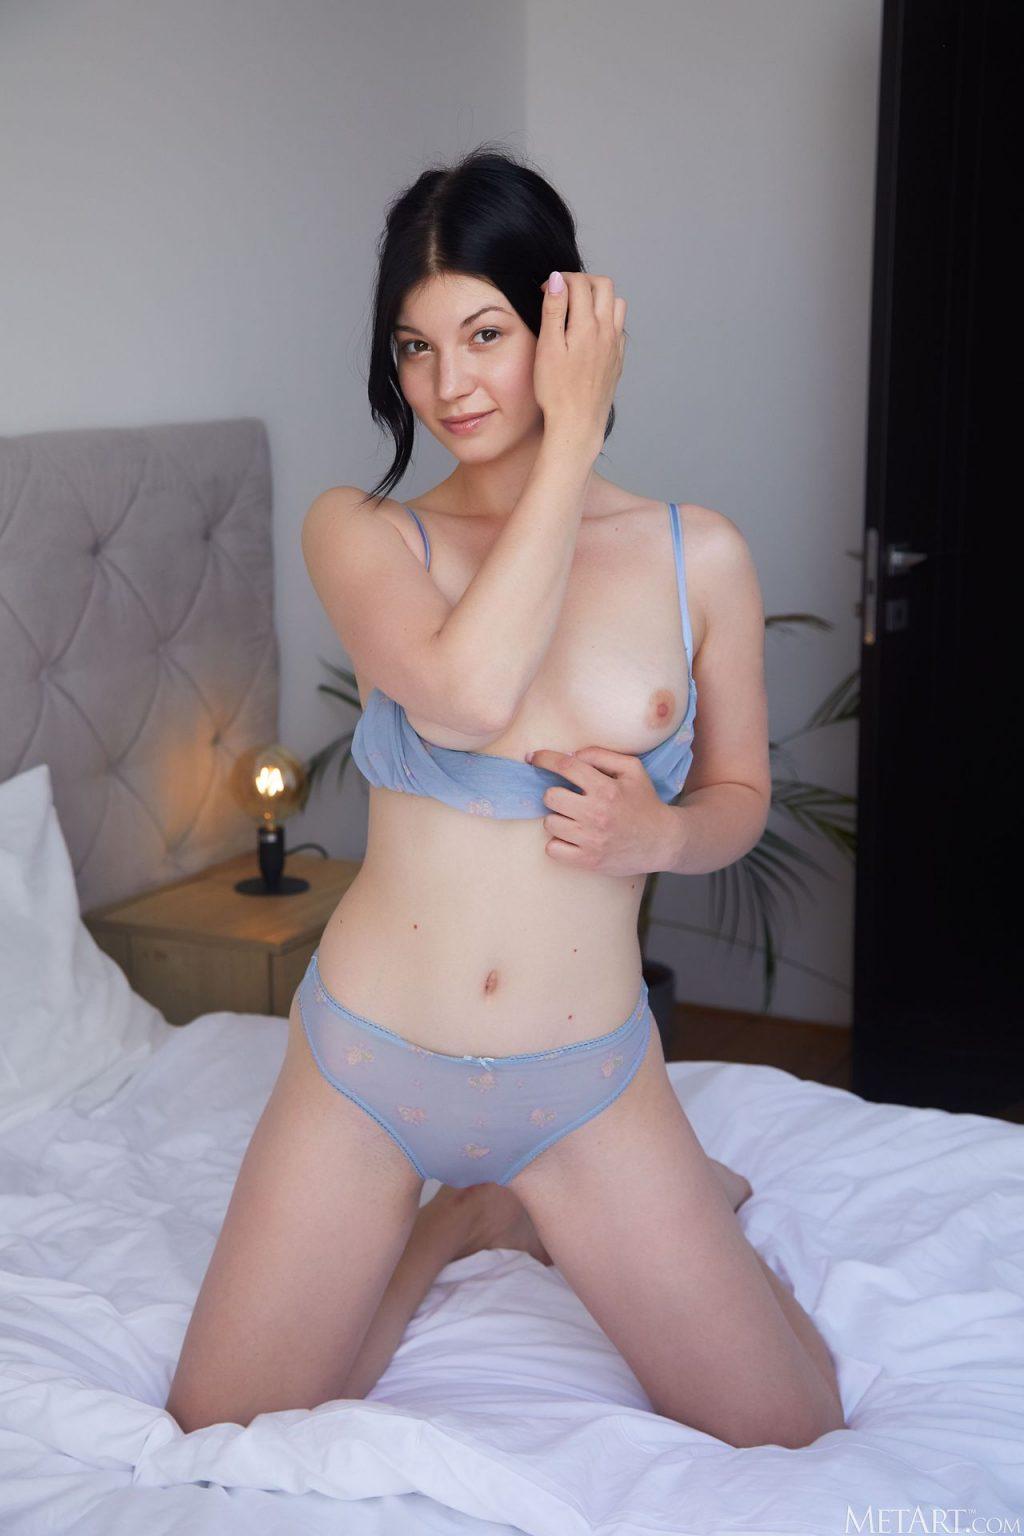 Nessie Blue Nude & Sexy – Presenting (134 Photos)